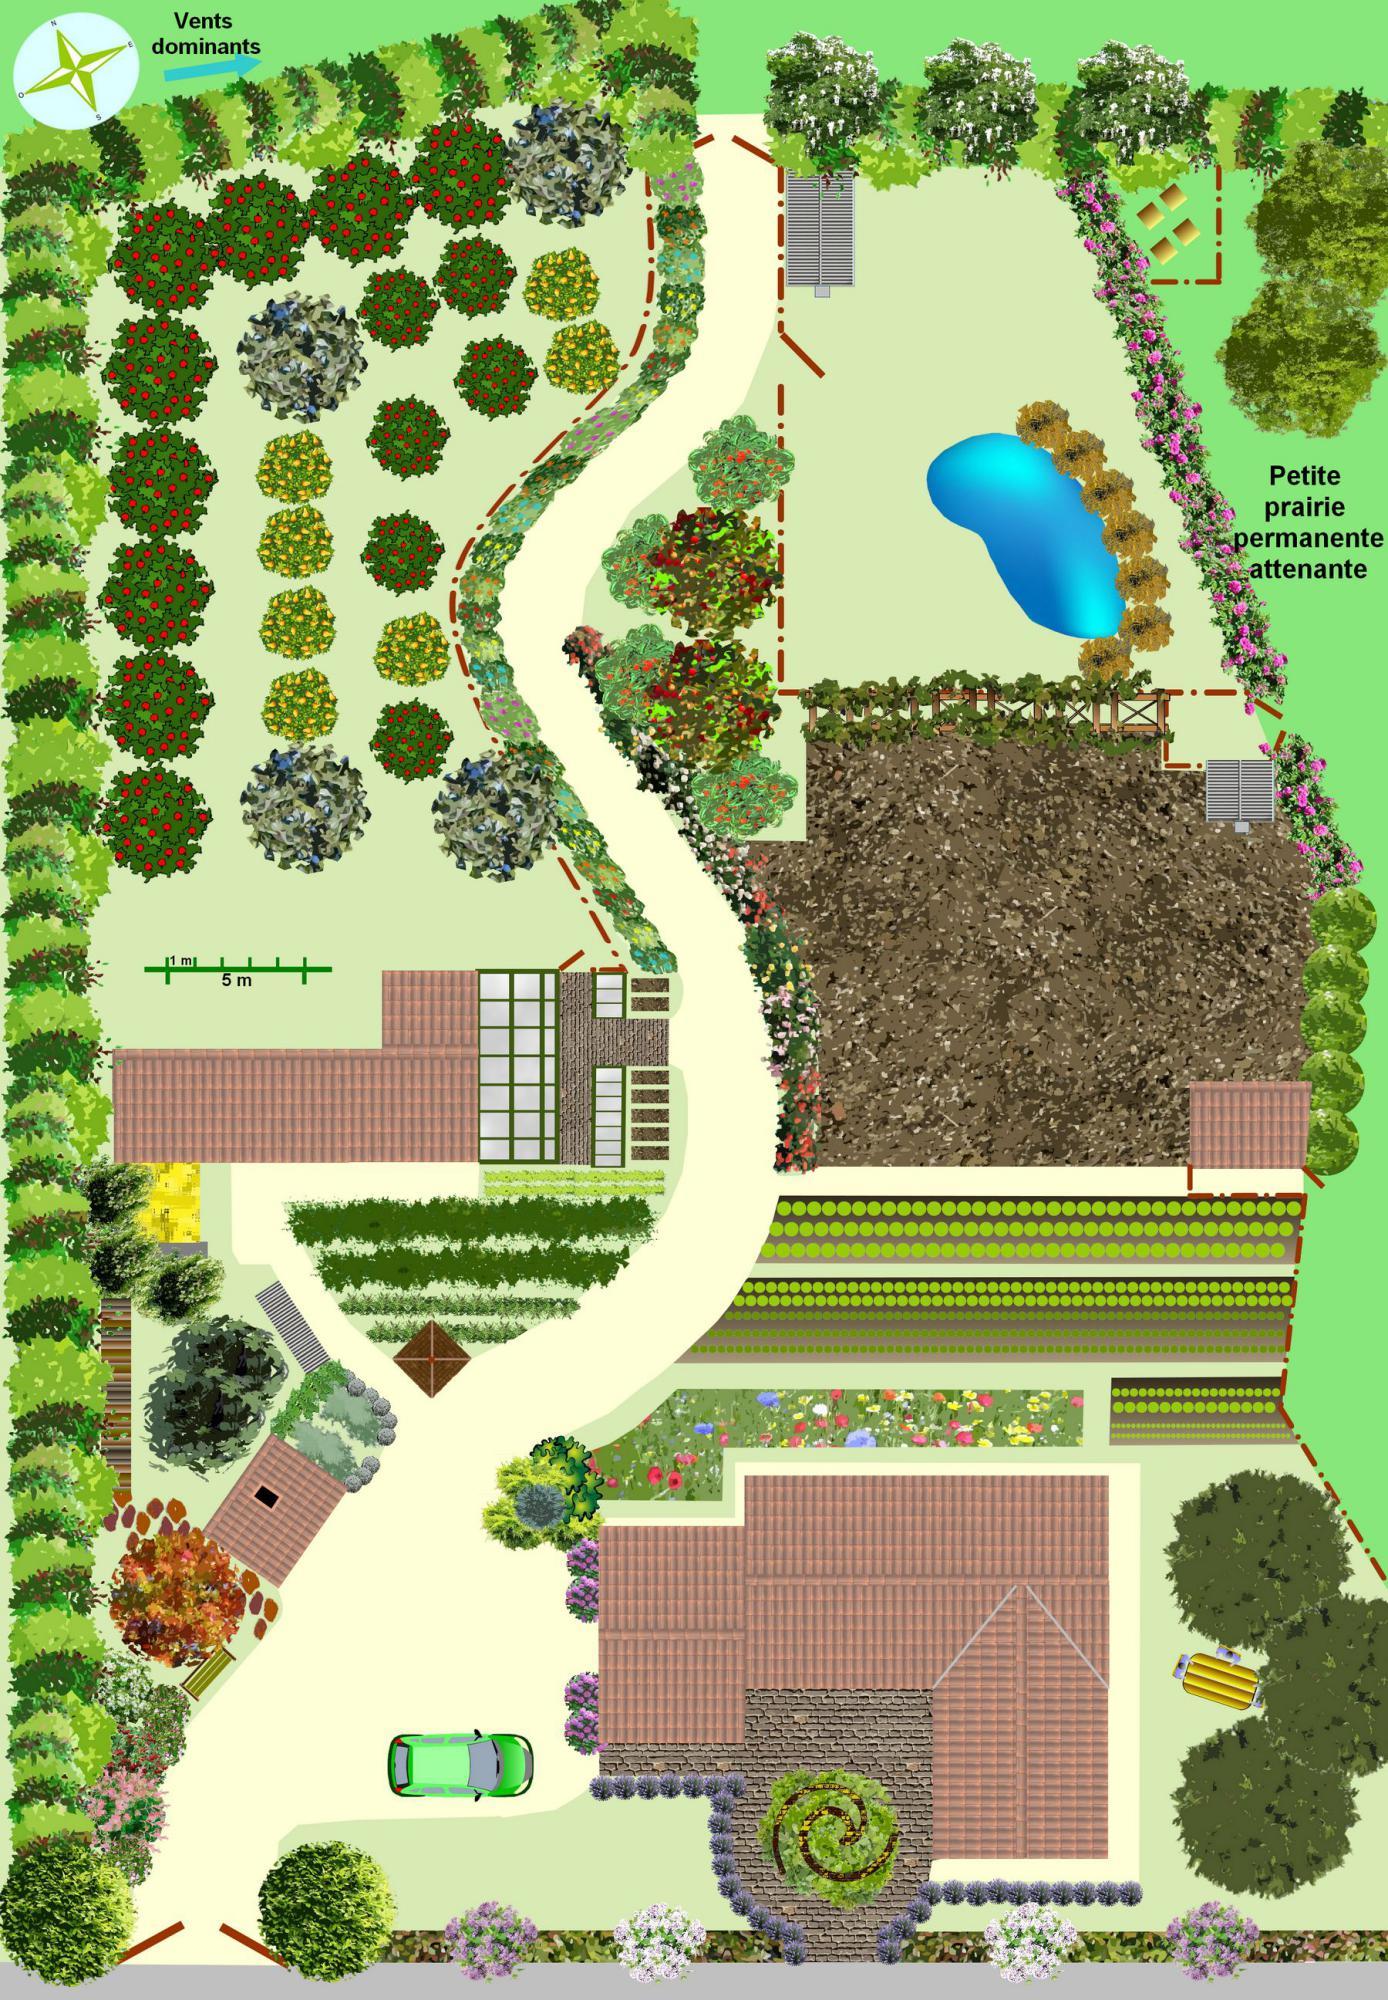 Cr er un jardin en permaculture plan - Creer un jardin mediterraneen avignon ...